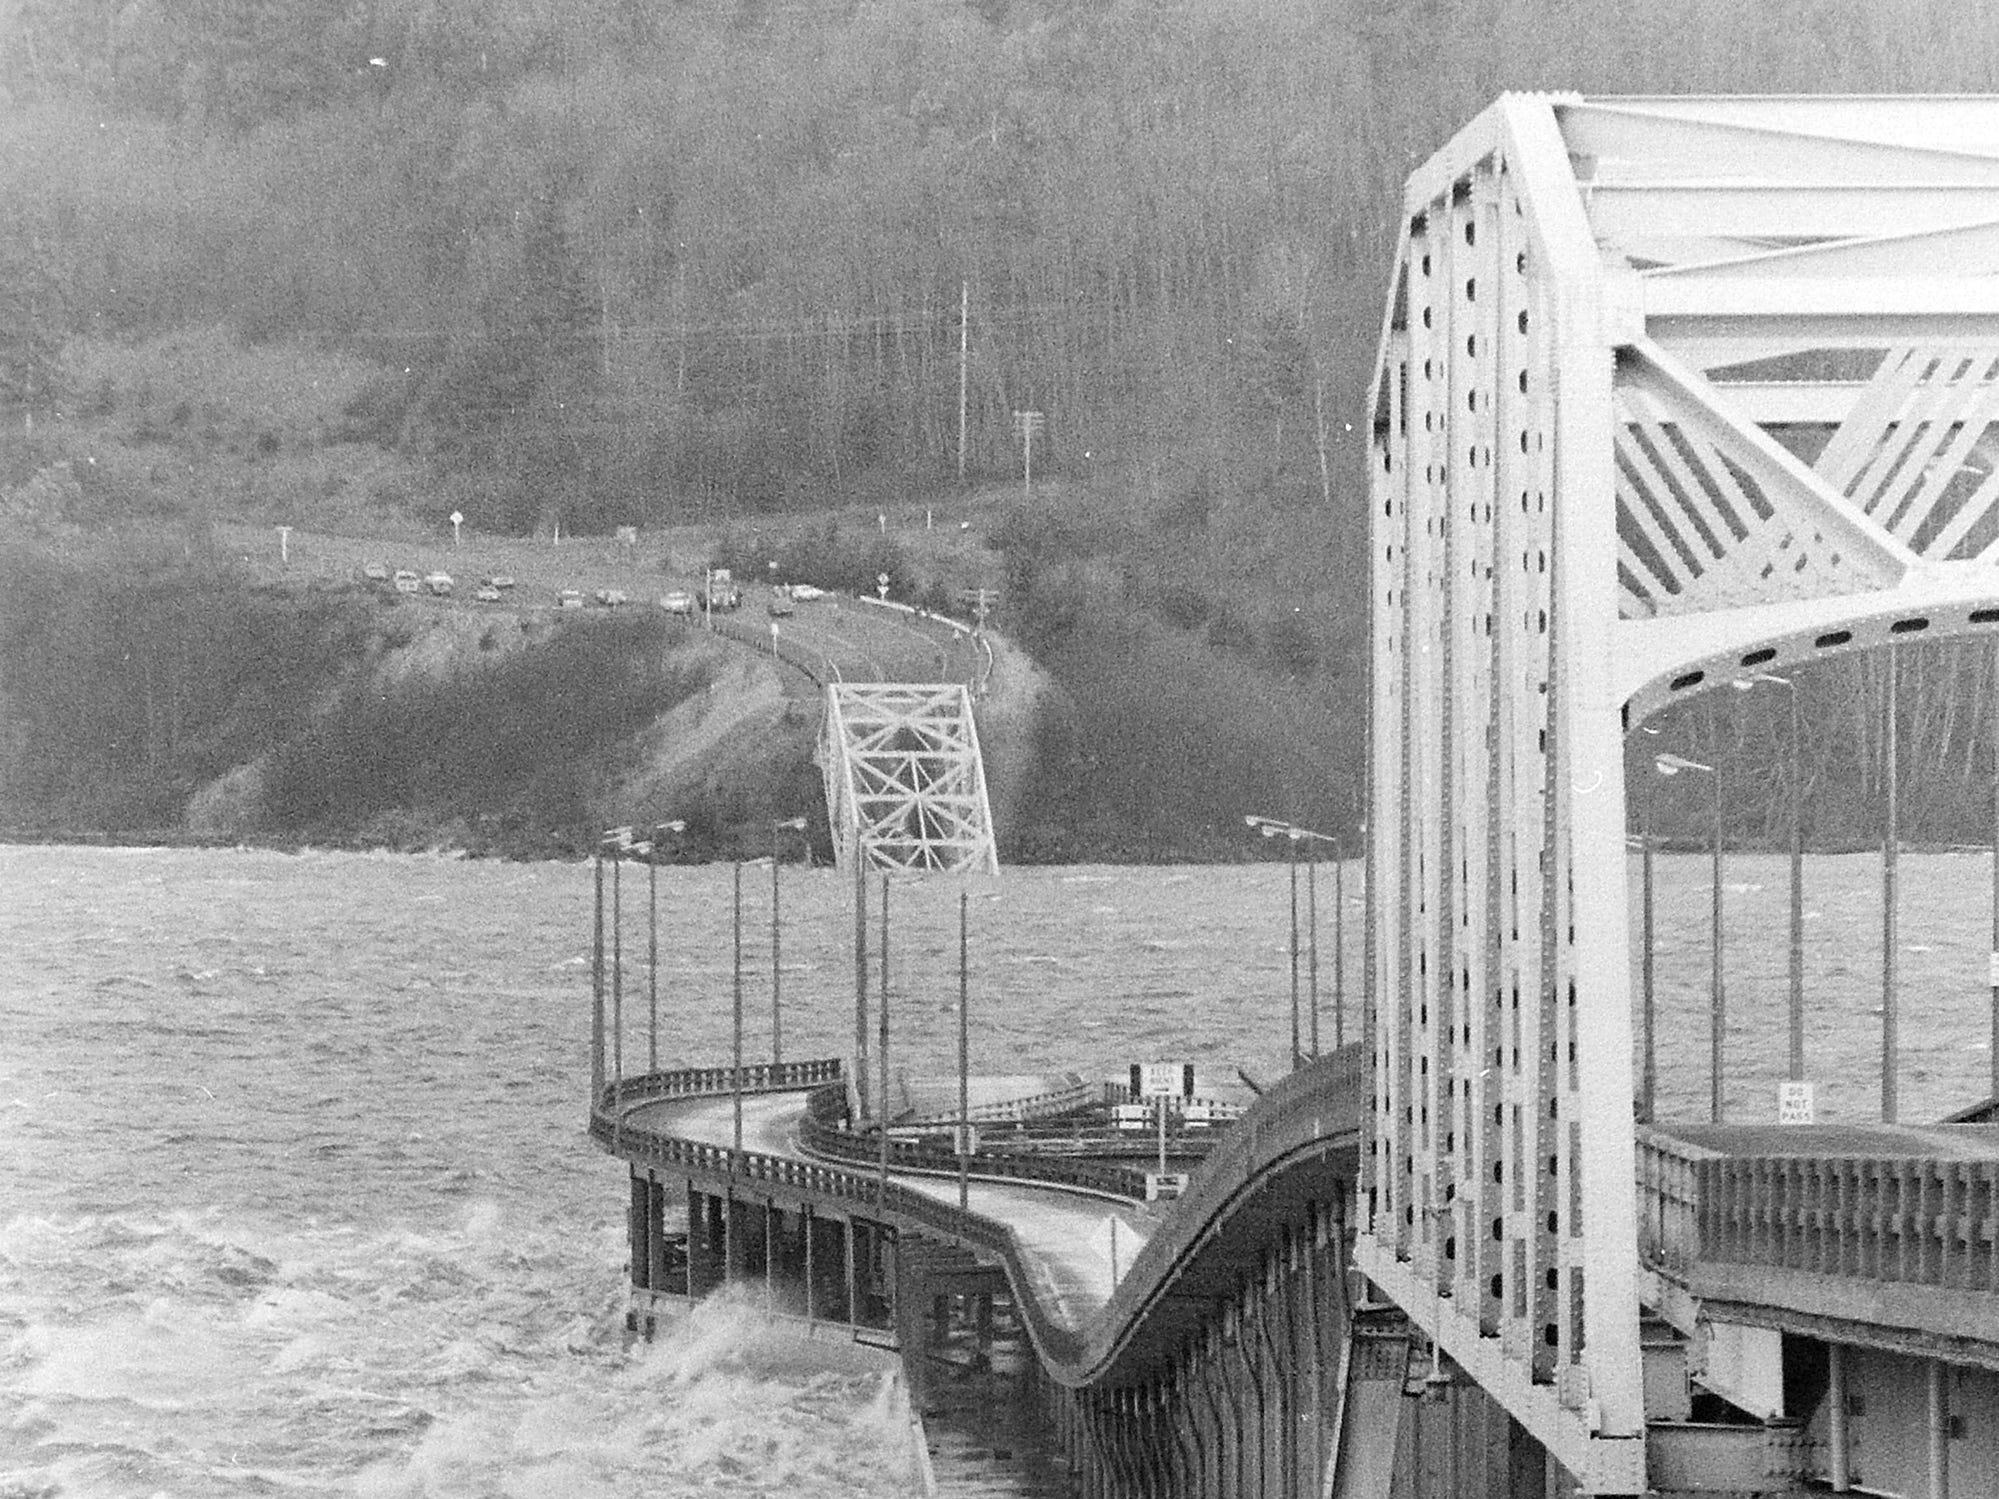 02/13/79 Hood Canal Bridge Damage